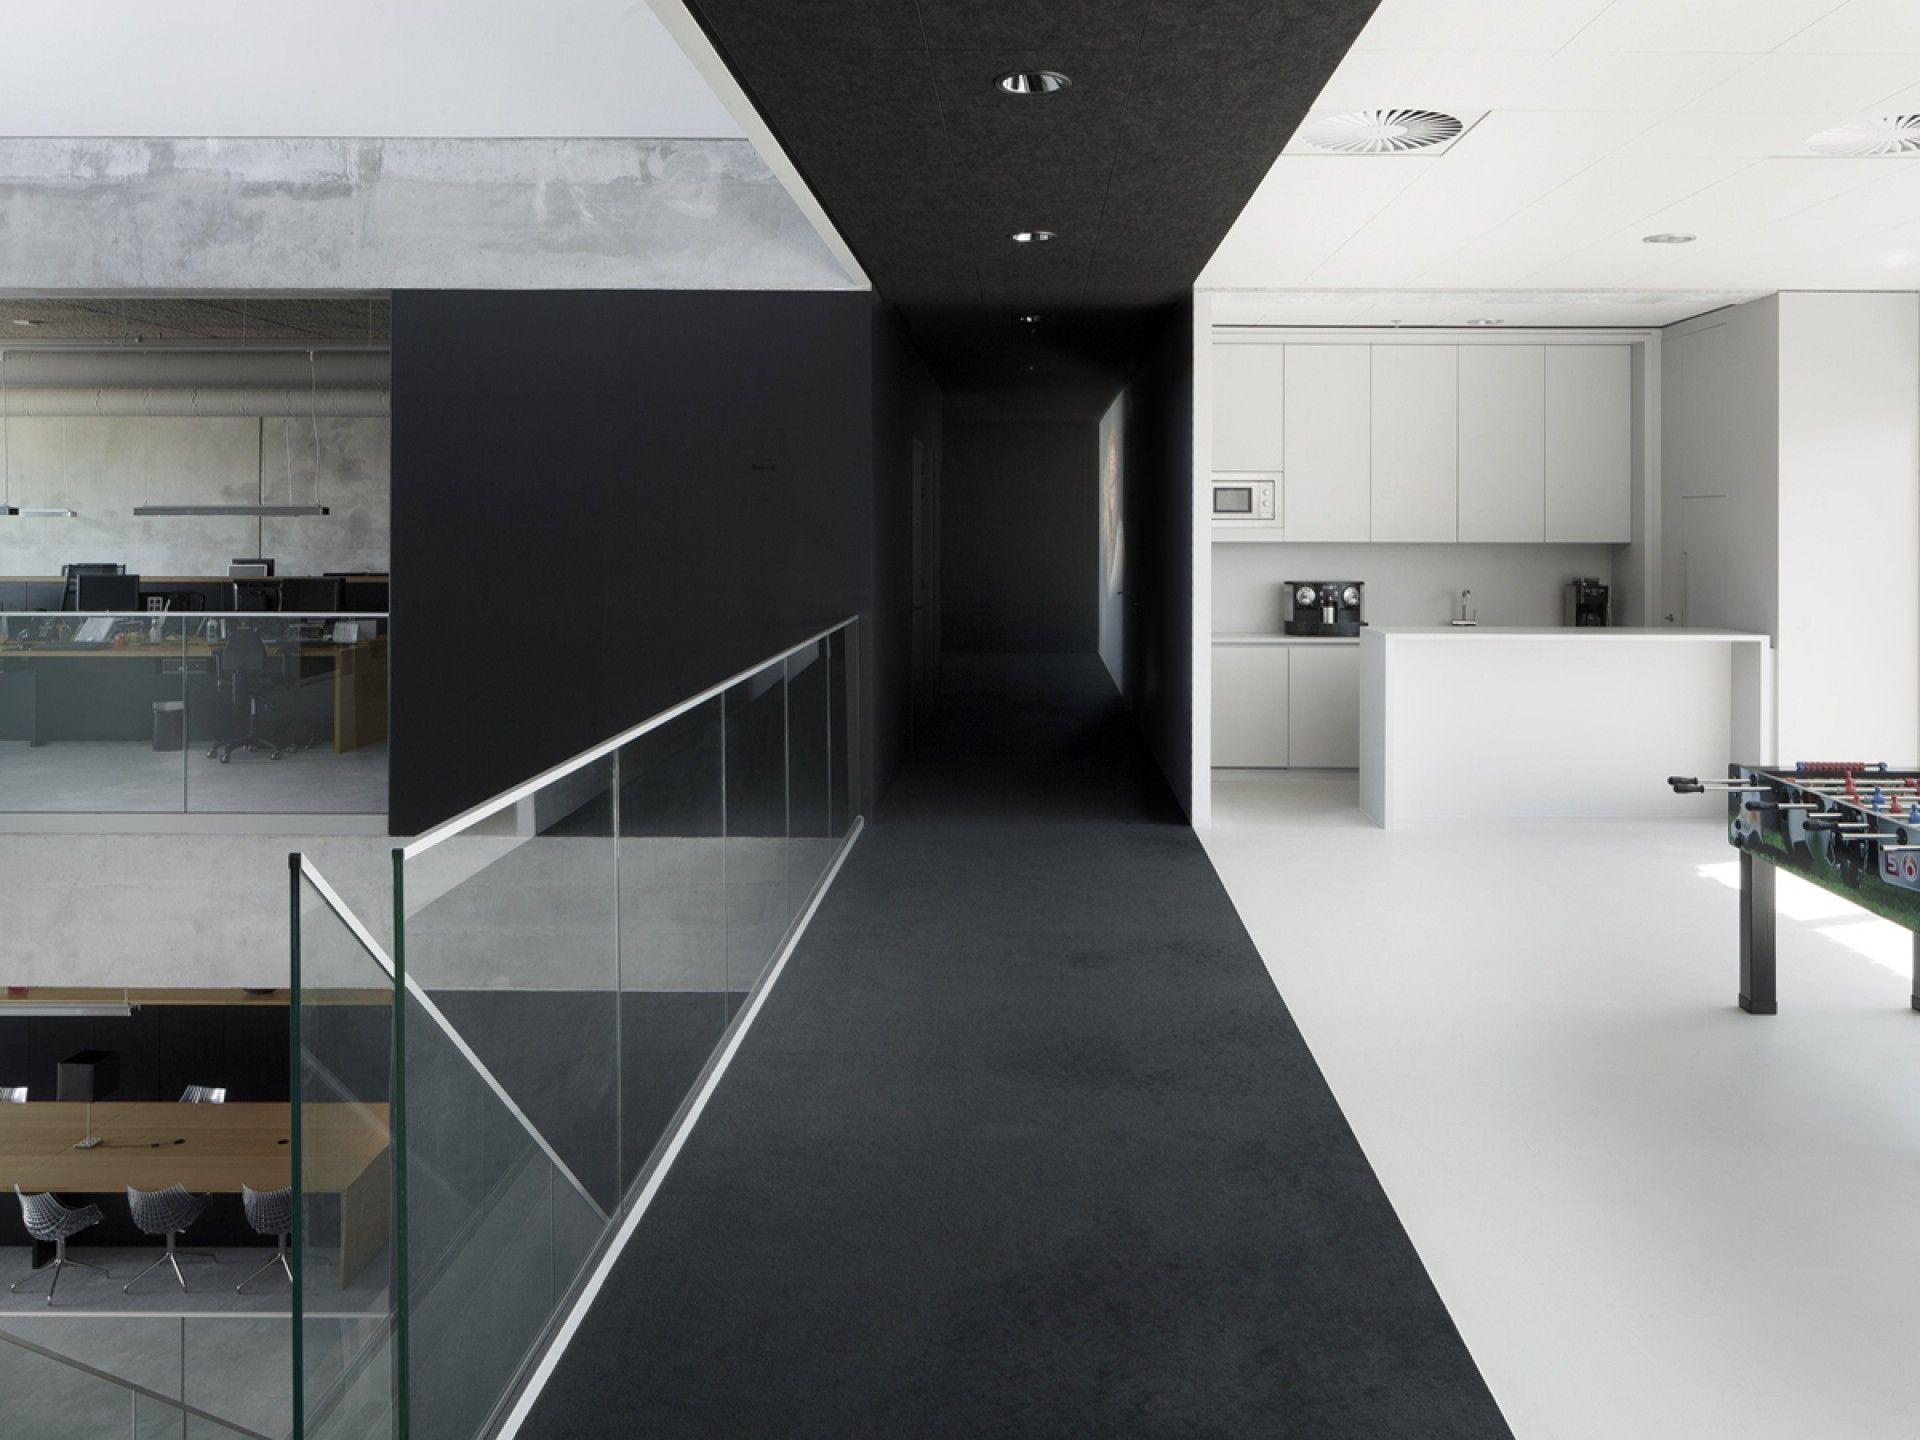 Bureau impact communication design a sh agence architecture